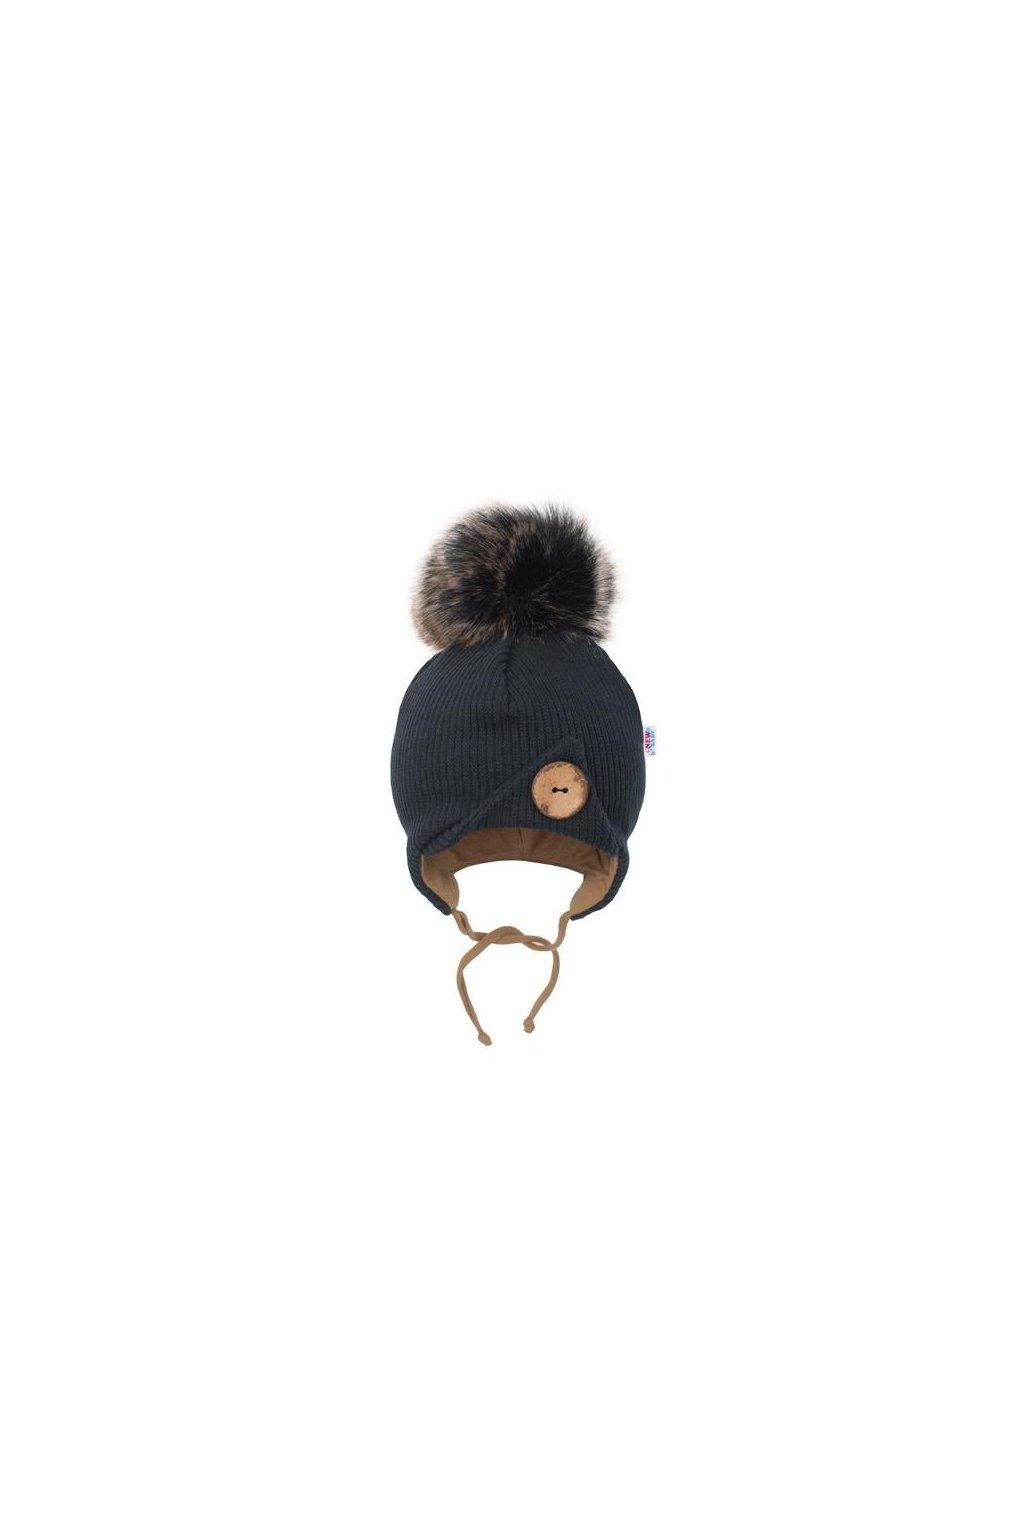 Dojčenská zimná čiapočka New Baby Great čierna